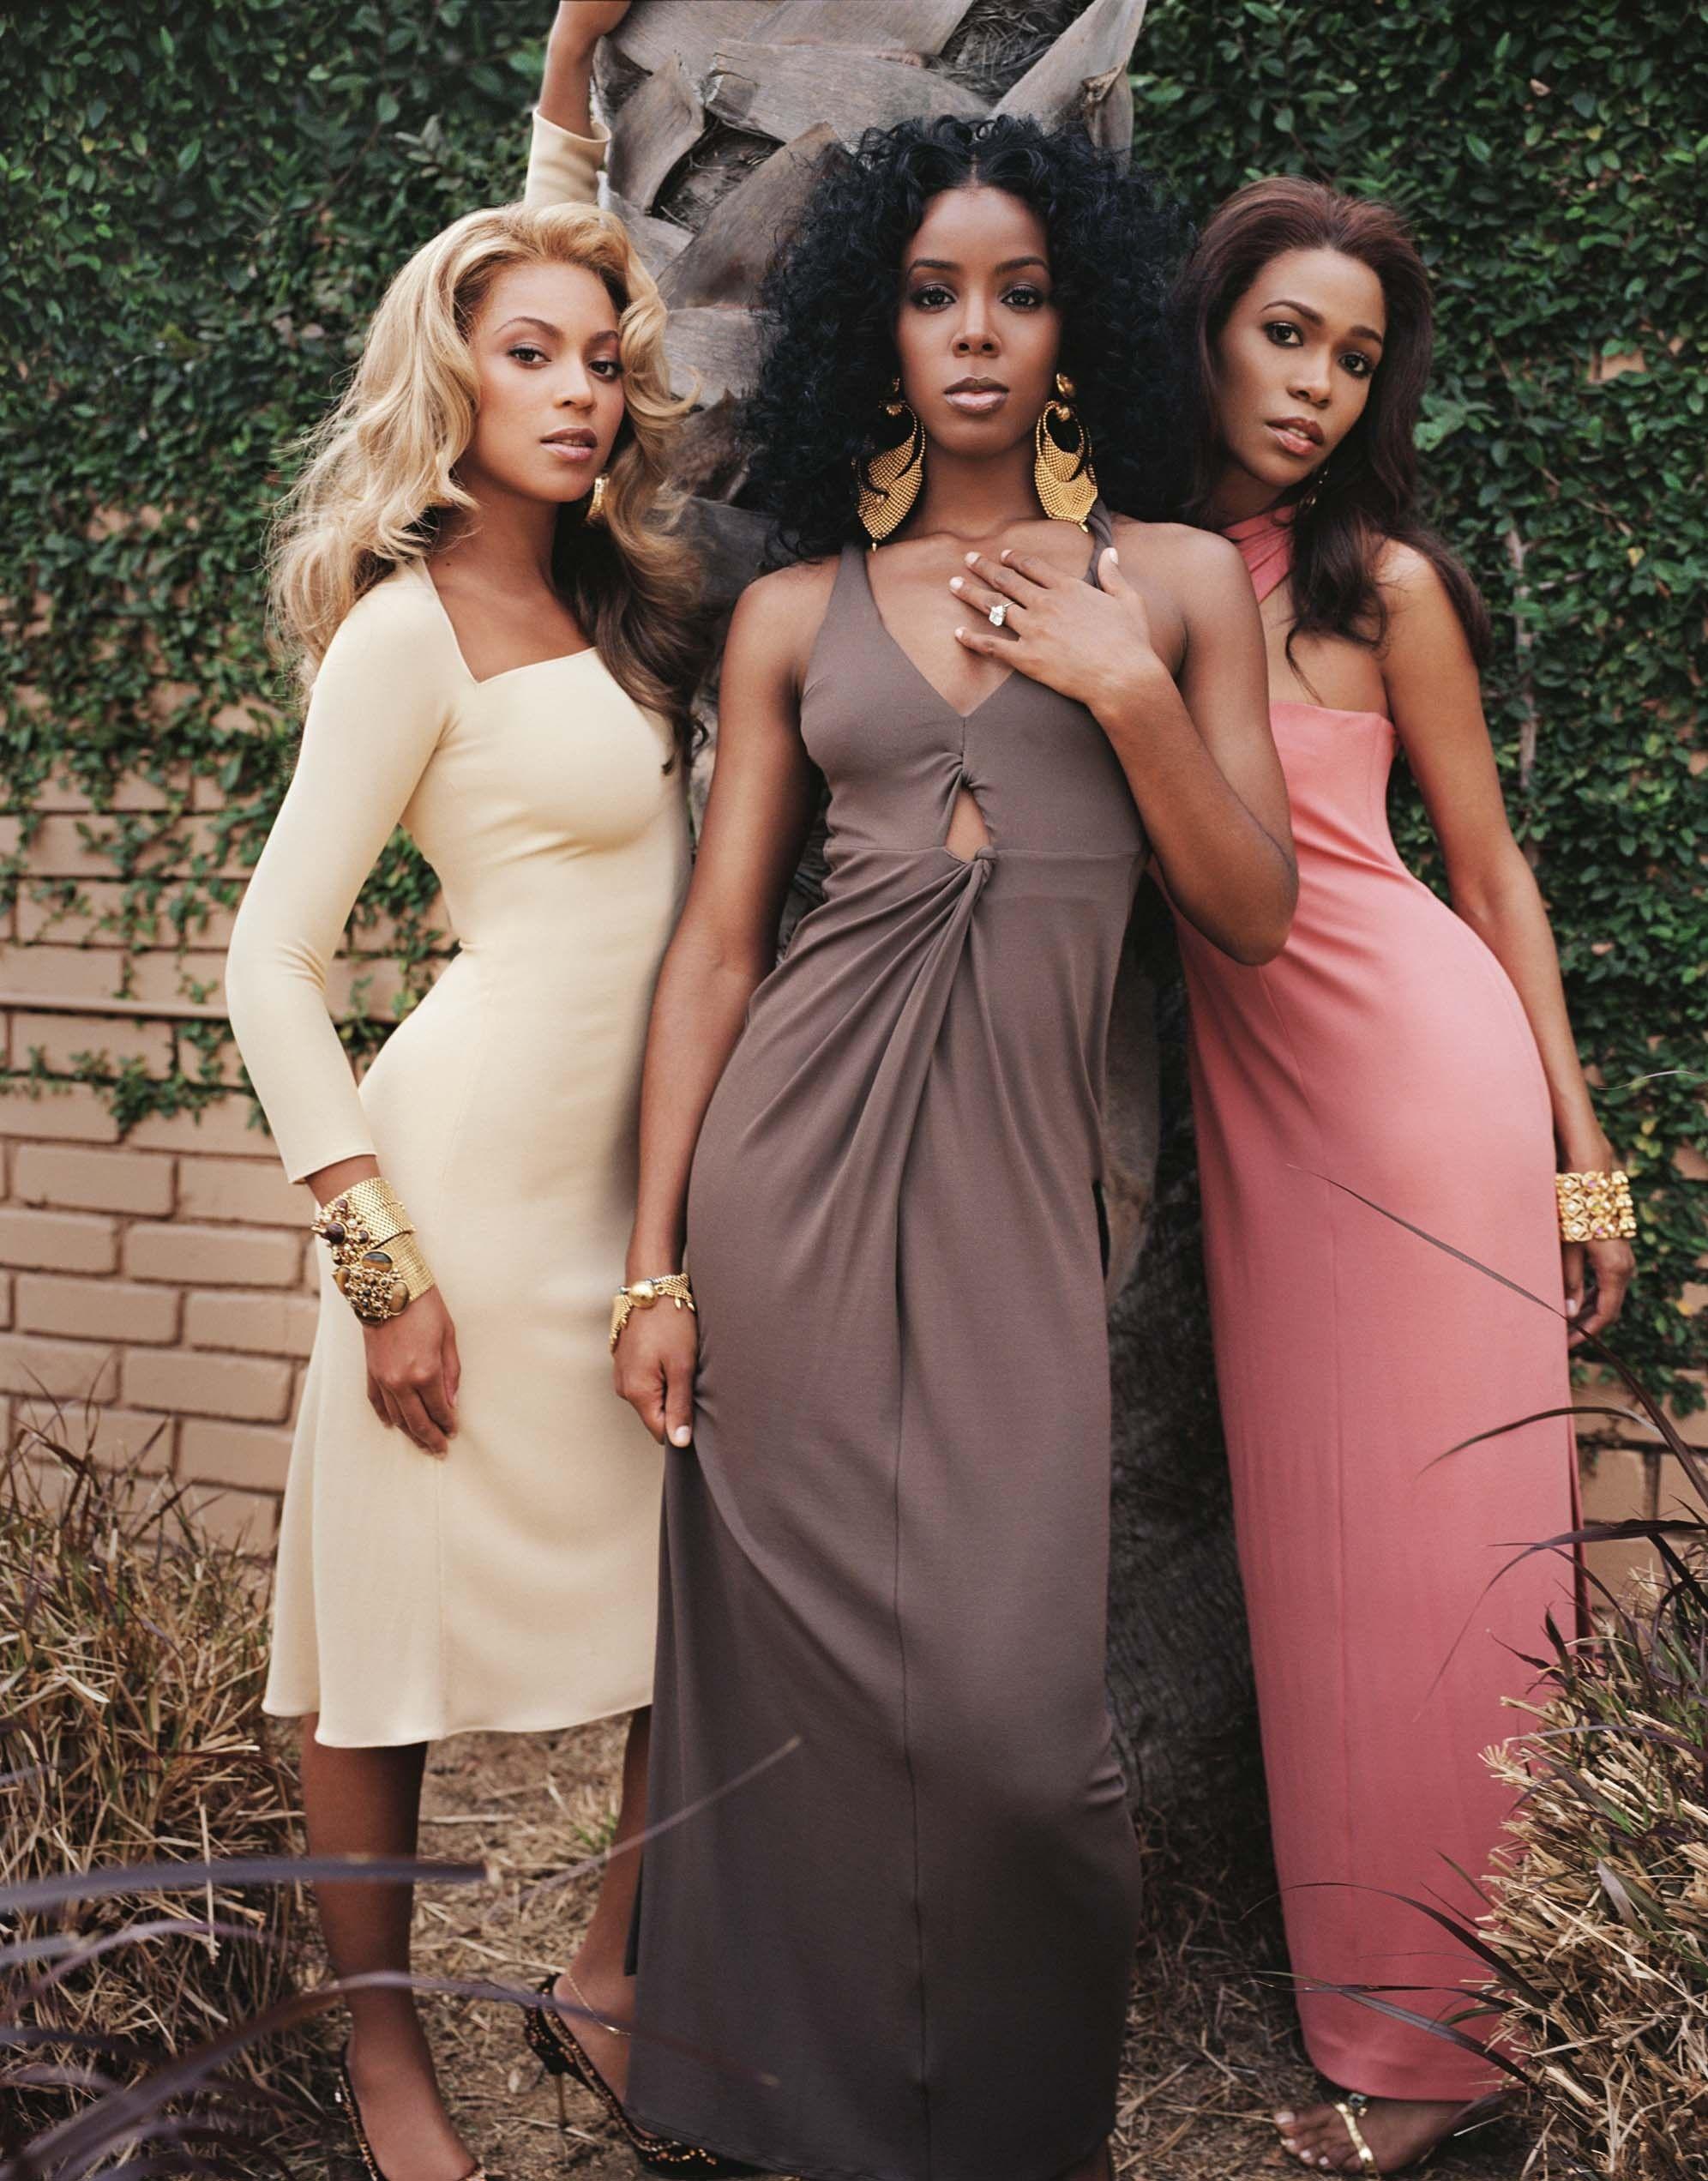 Destiny s Child R B soul hip hop pop Girl group Beyonce Knowles